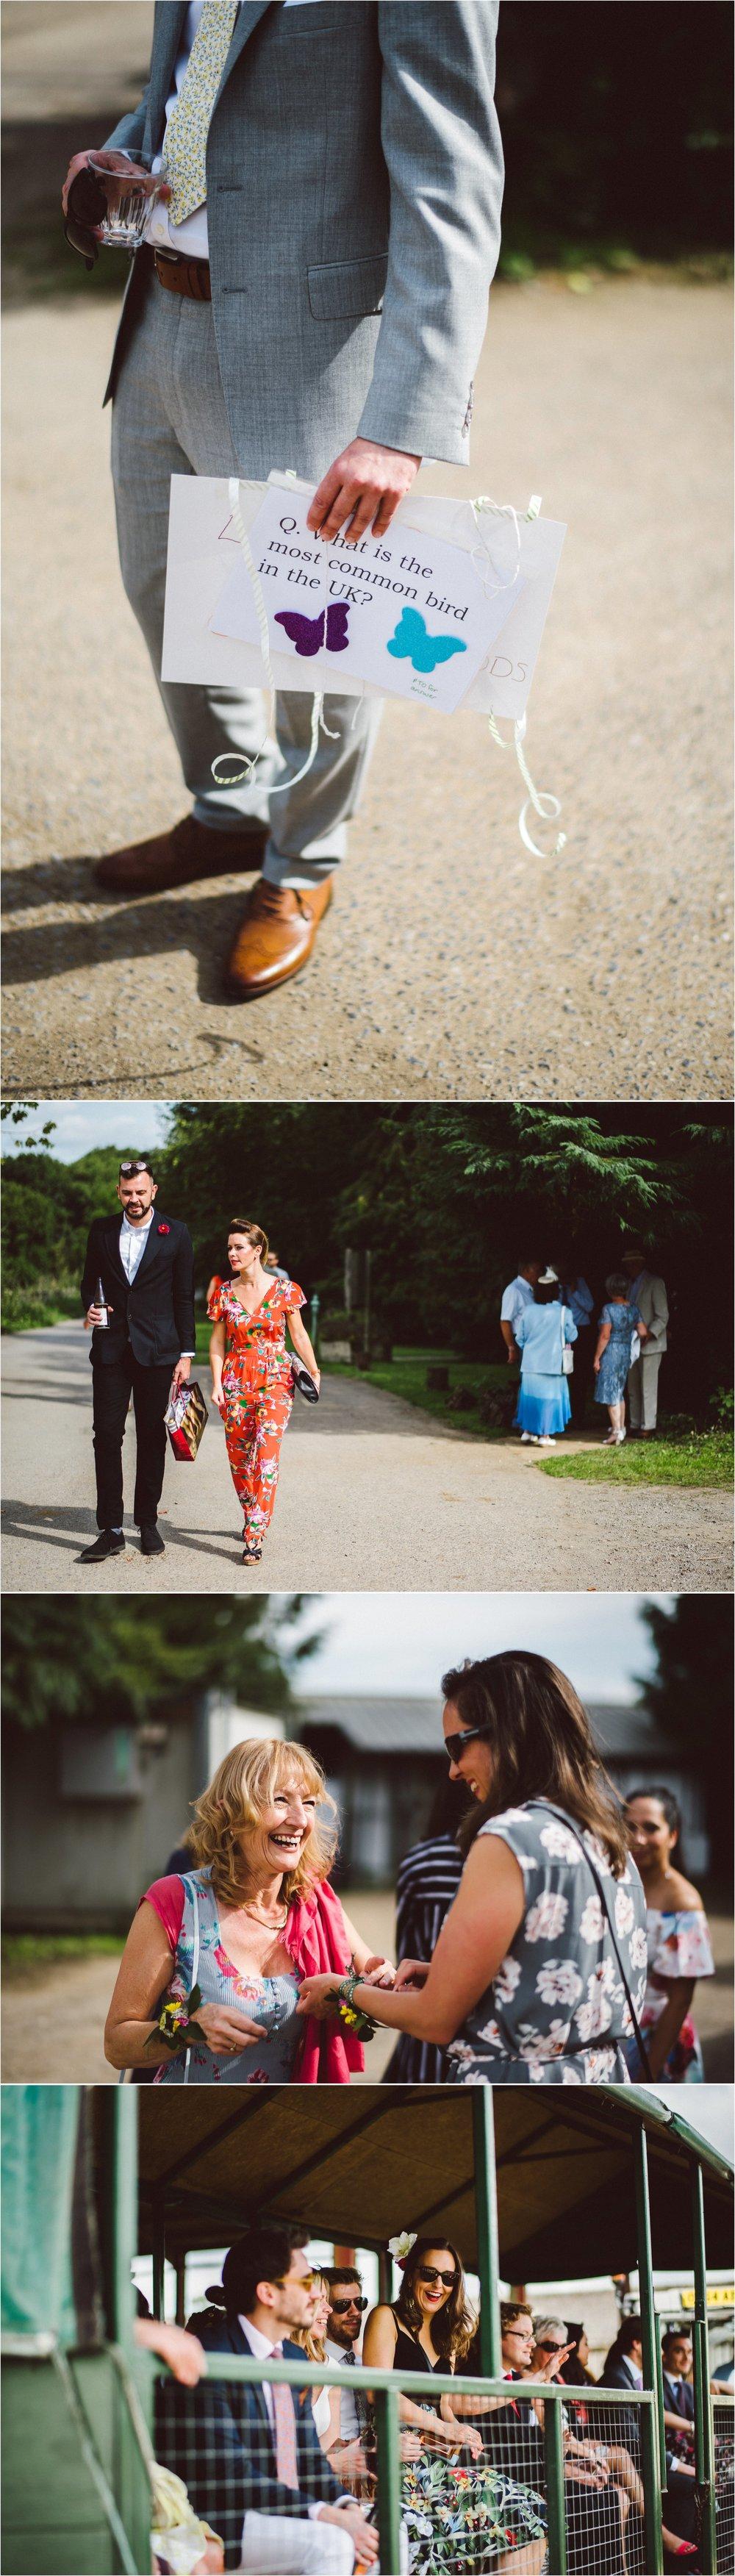 Gloucestershire outdoor wedding photographer_0030.jpg